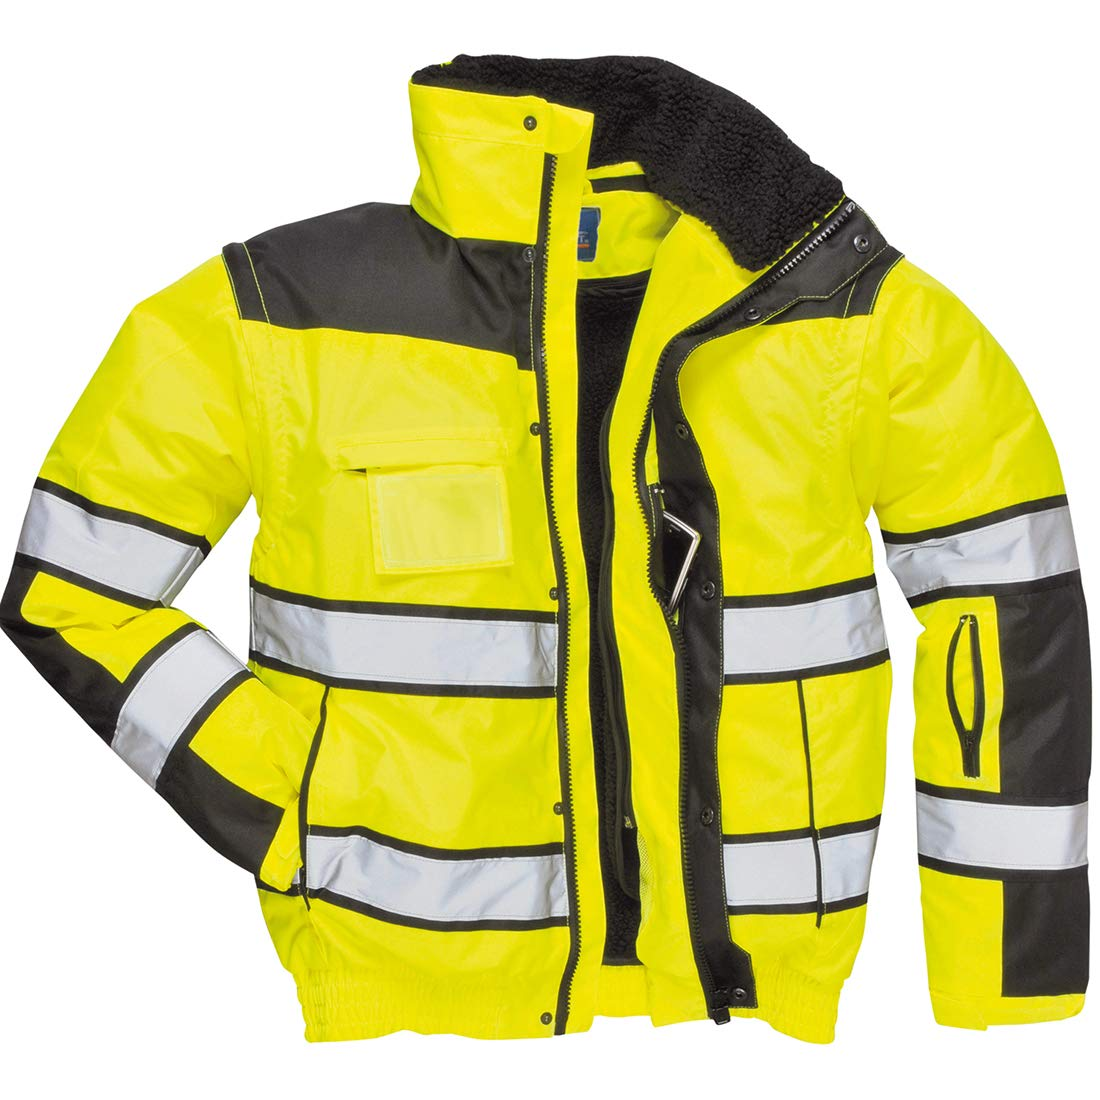 Portwest UC466YBRXXXL Regular Fit Hi-Vis Classic Bomber Jacket, 3X-Large, Yellow/Black by Portwest